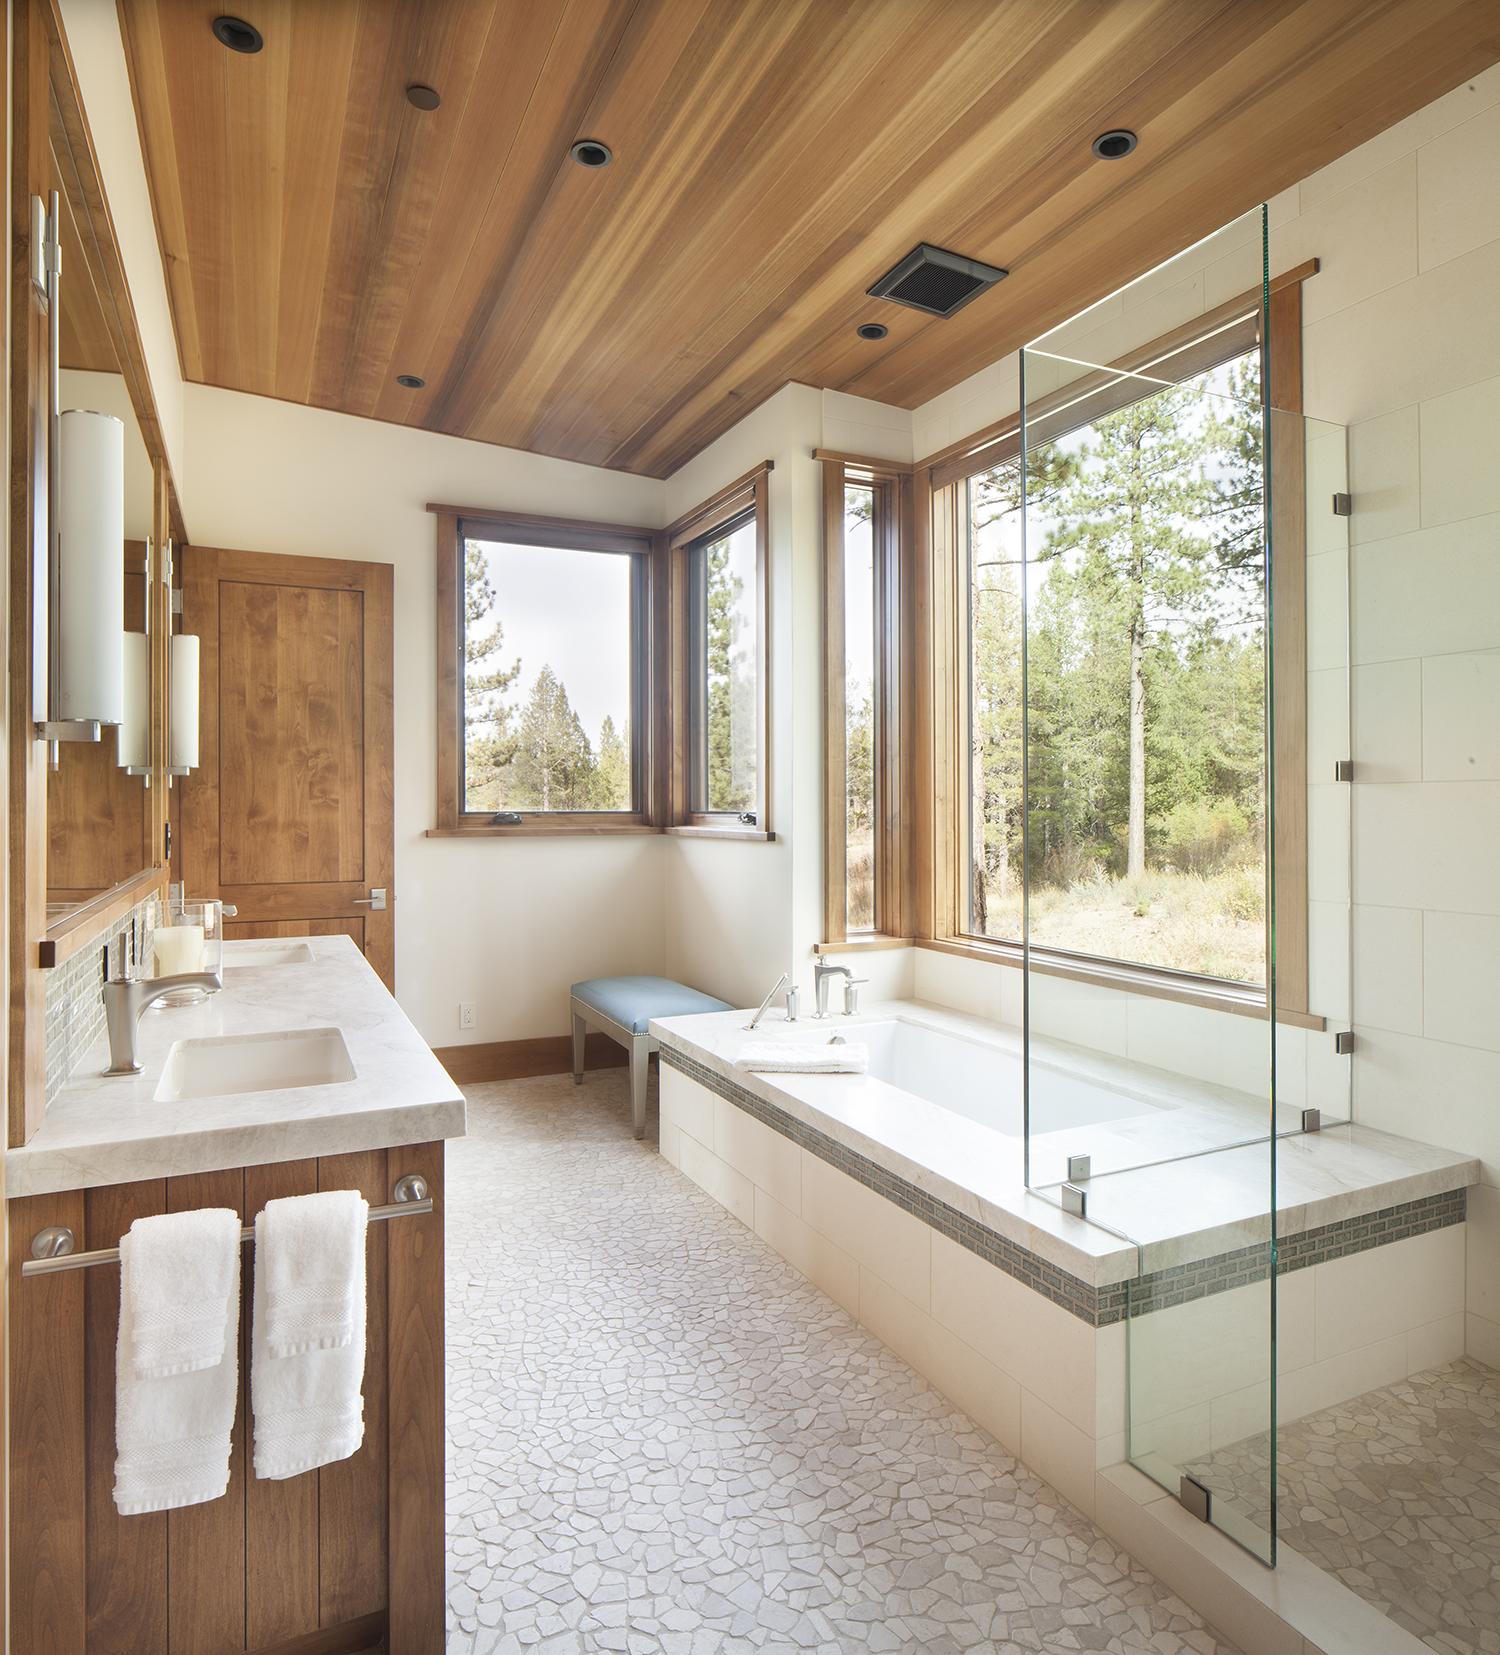 Lot 483_Guest Master Bath_Builtin Tub_Tile Floors_Vanity.jpg